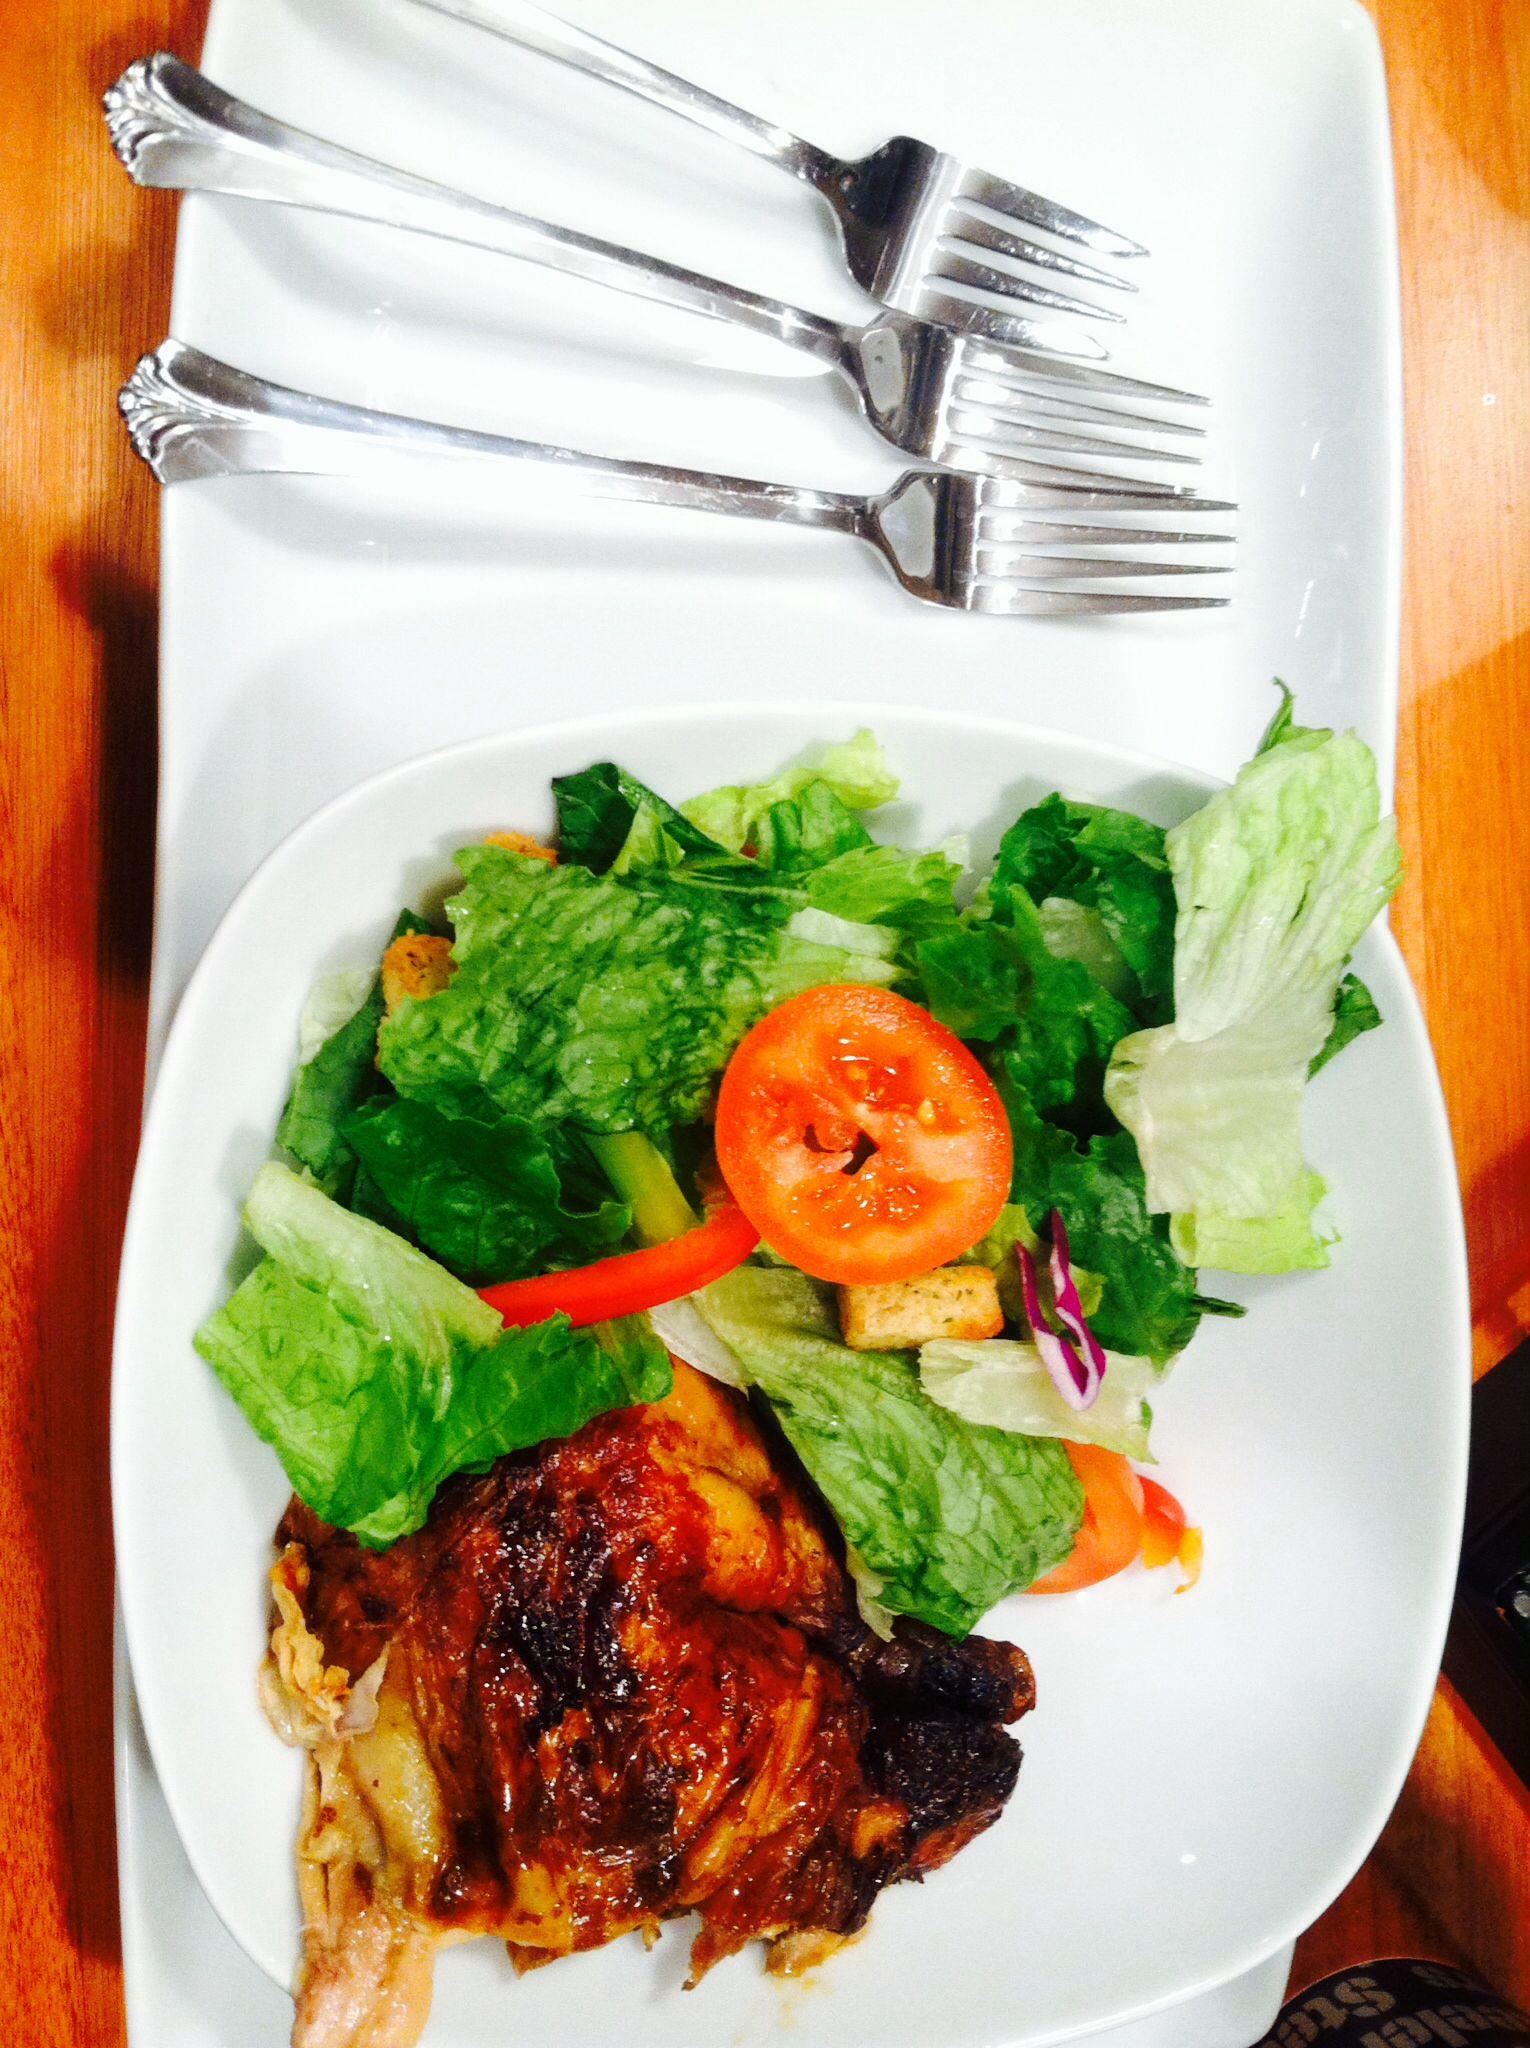 I'm in a salad mood so let's make a tasty one! Romain lettuce Sliced tomato Green or black olives Sliced red peppers Croutons  Low fat vinaigrette dressing Rotisary chicken from shop rite Optional: boiled egg slices & salt n' peppa!